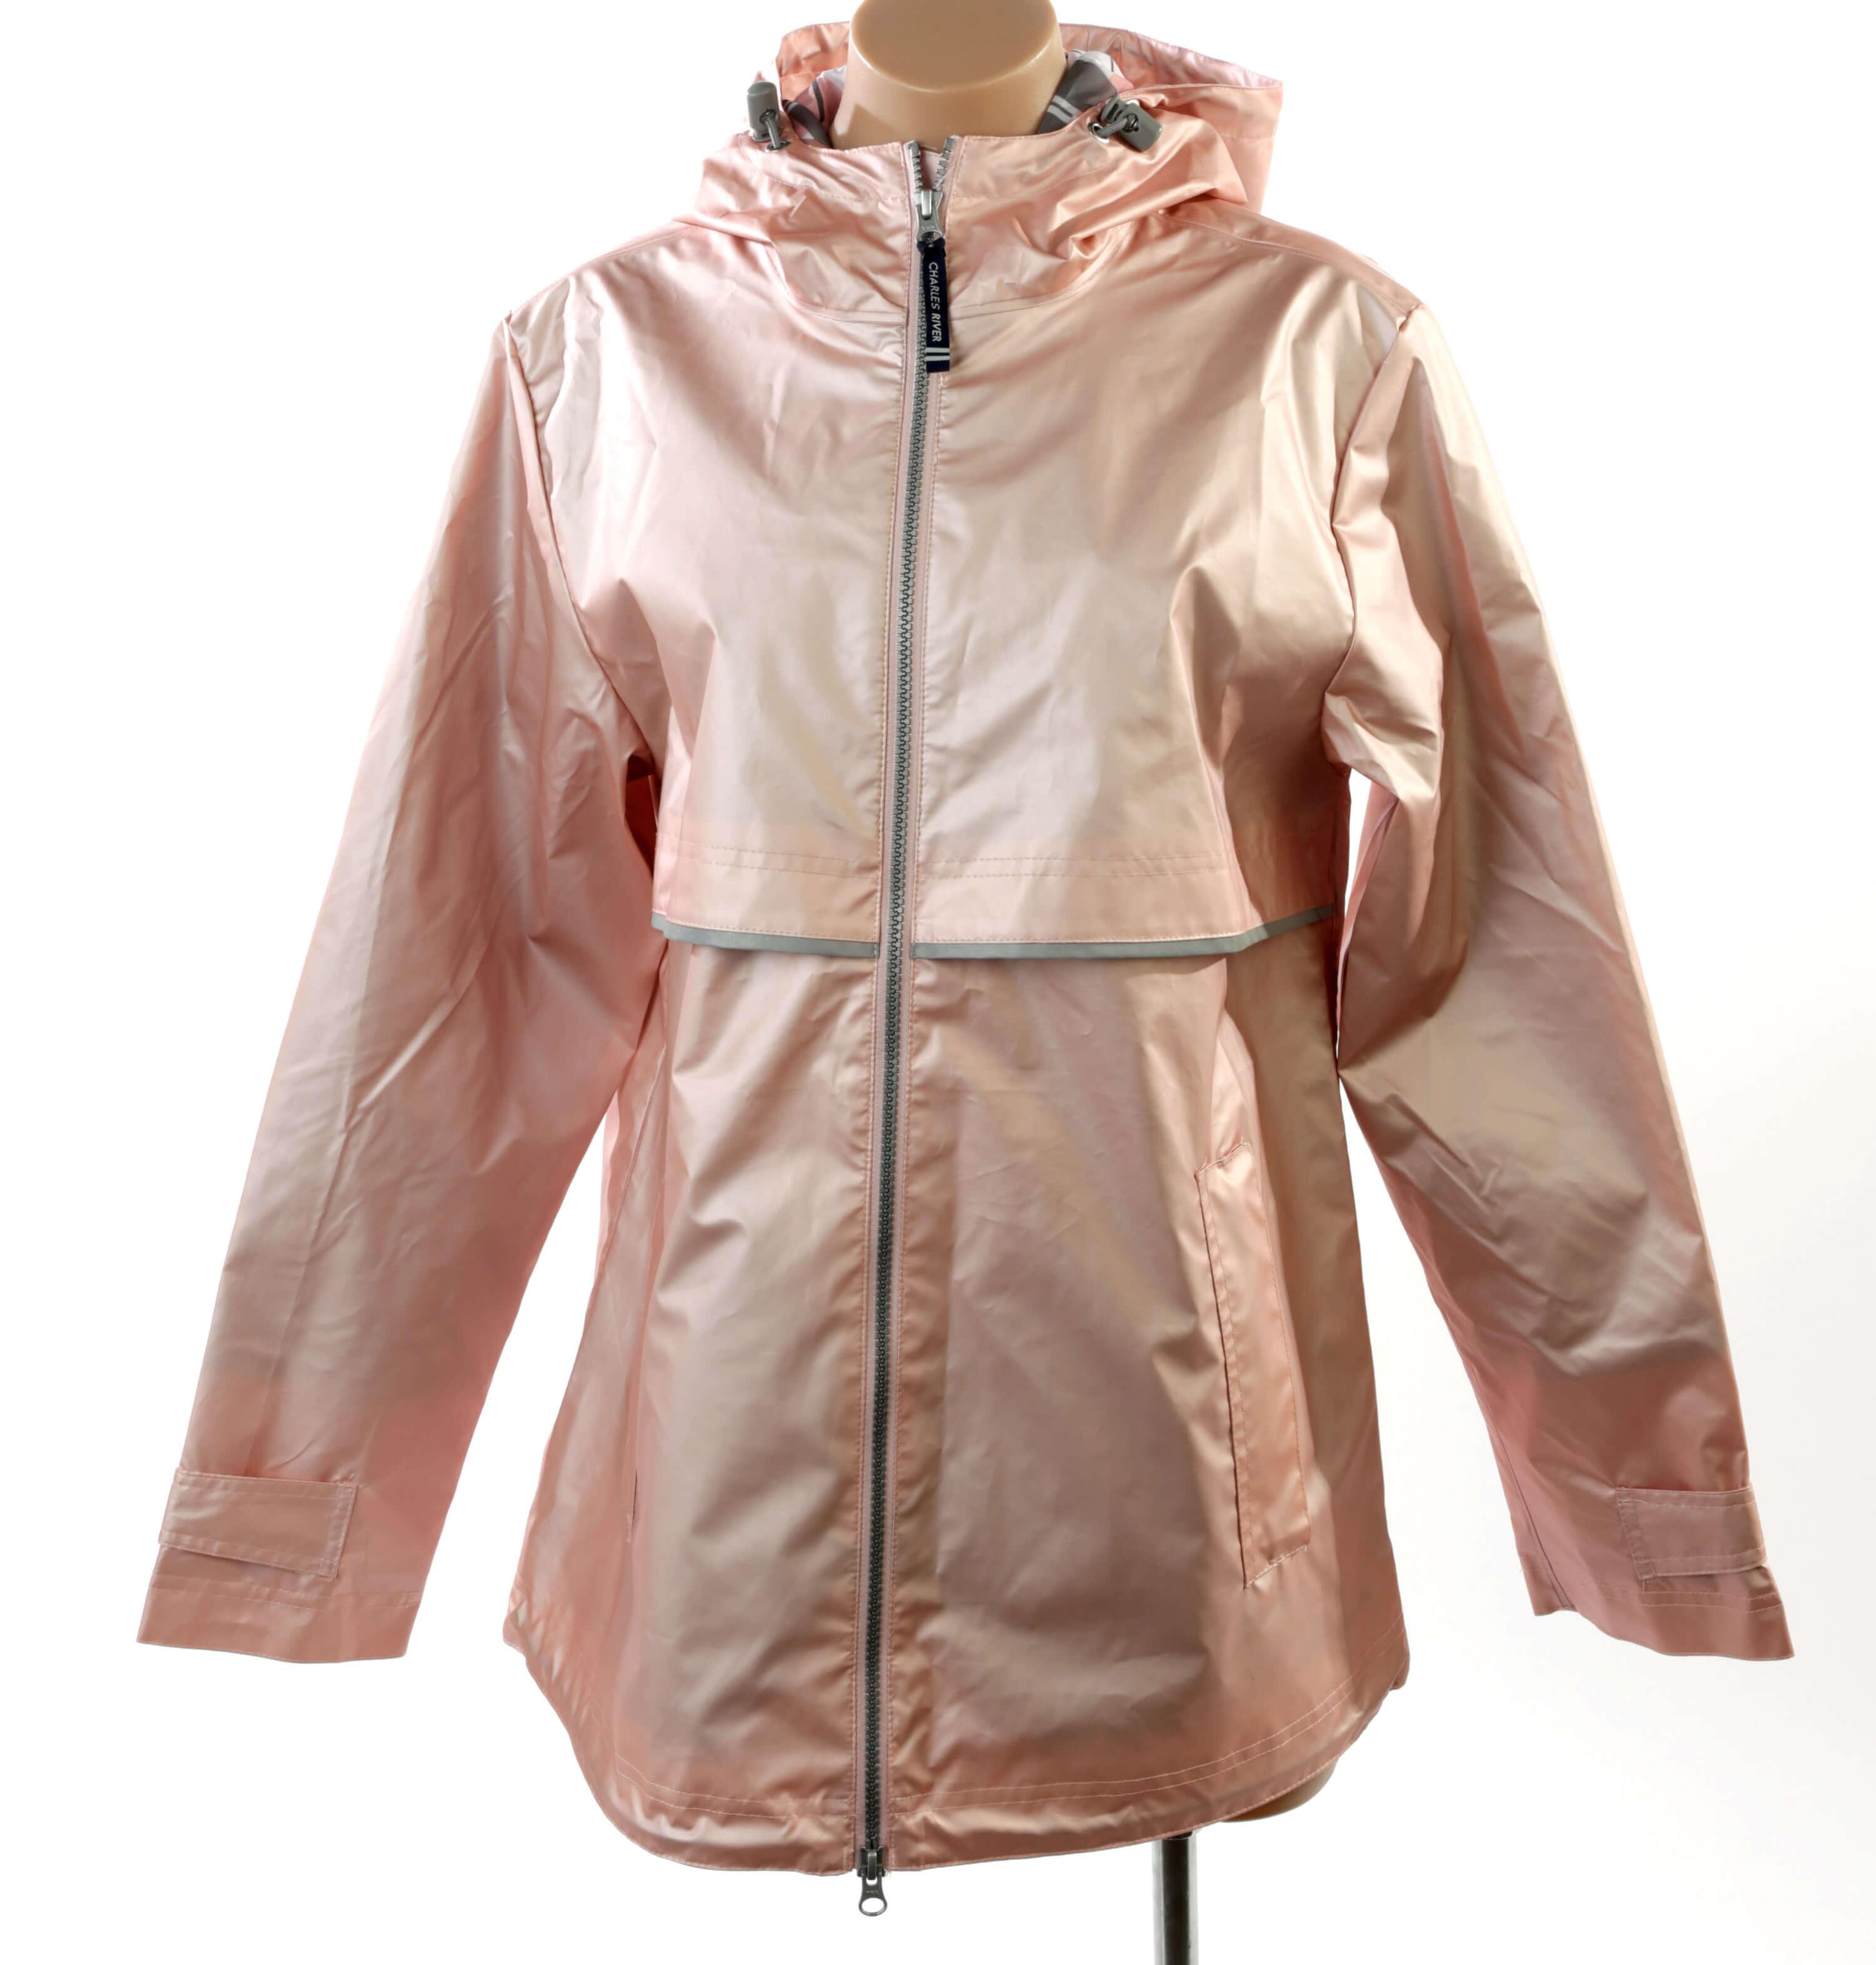 Rose gold rain jacket